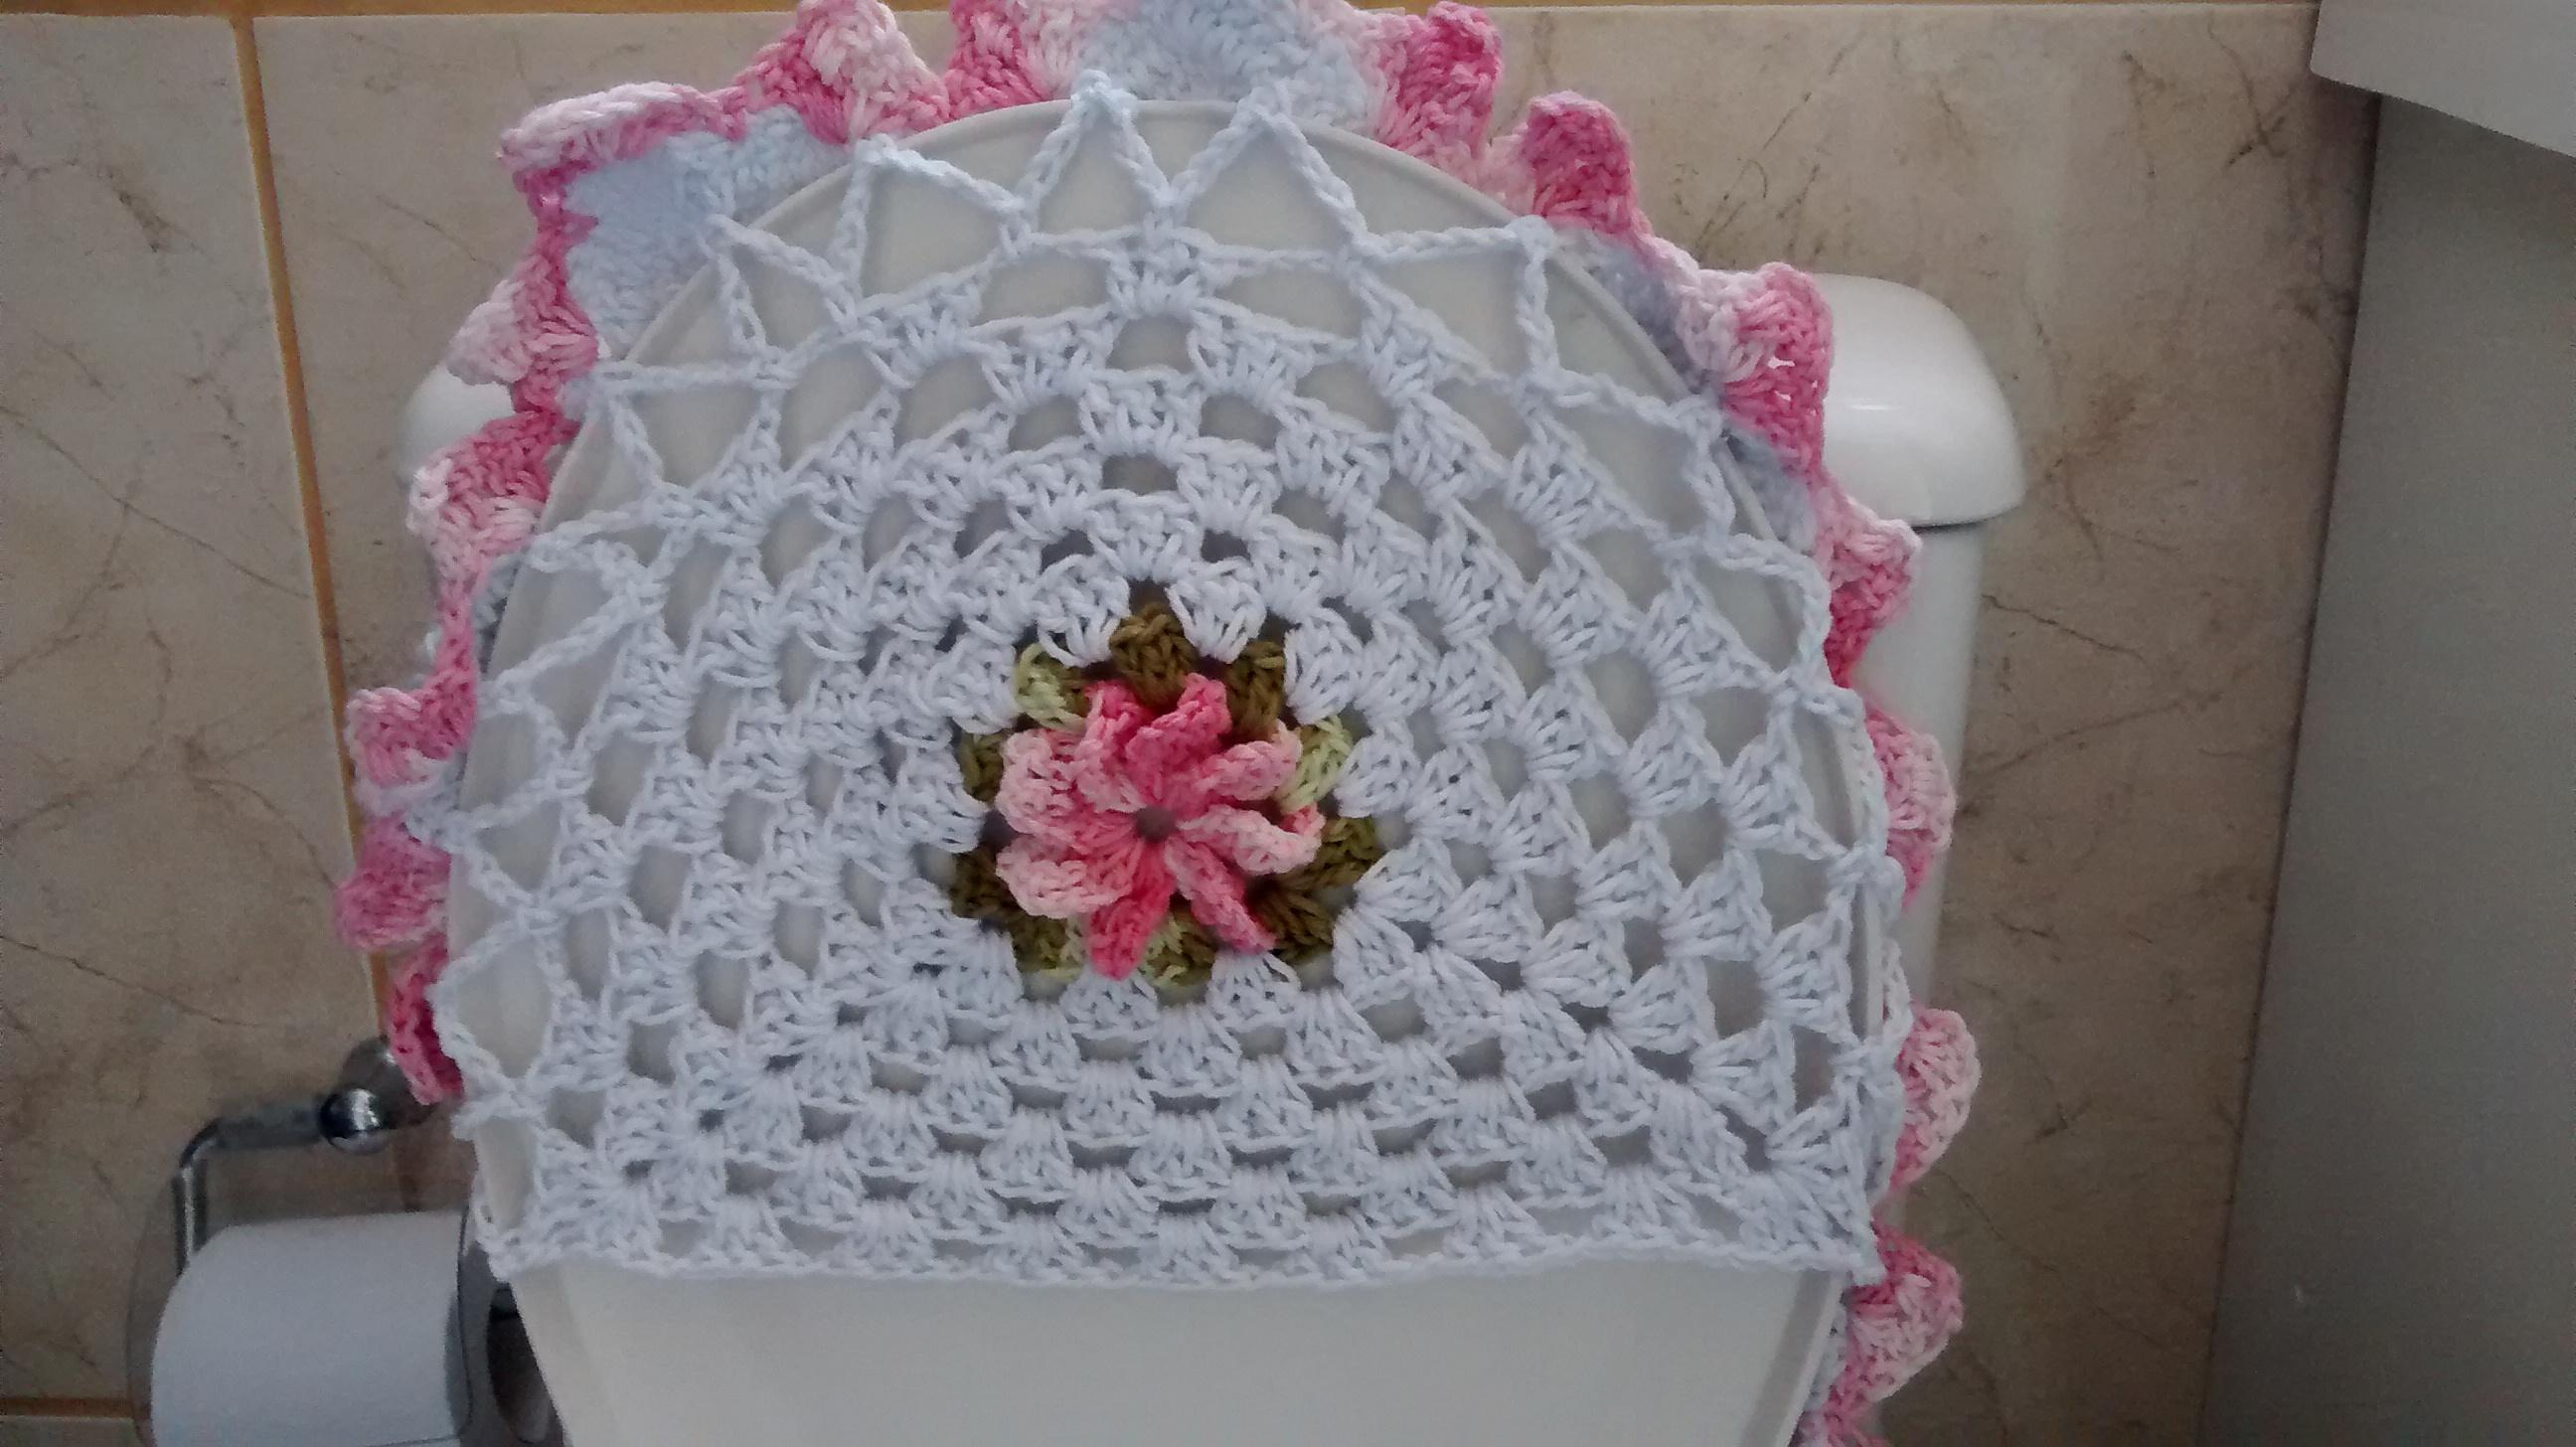 banheiro branco e rosa bebe tapete de barbante jg de banheiro branco e  #87445D 2592x1456 Banheiro Branco E Rosa